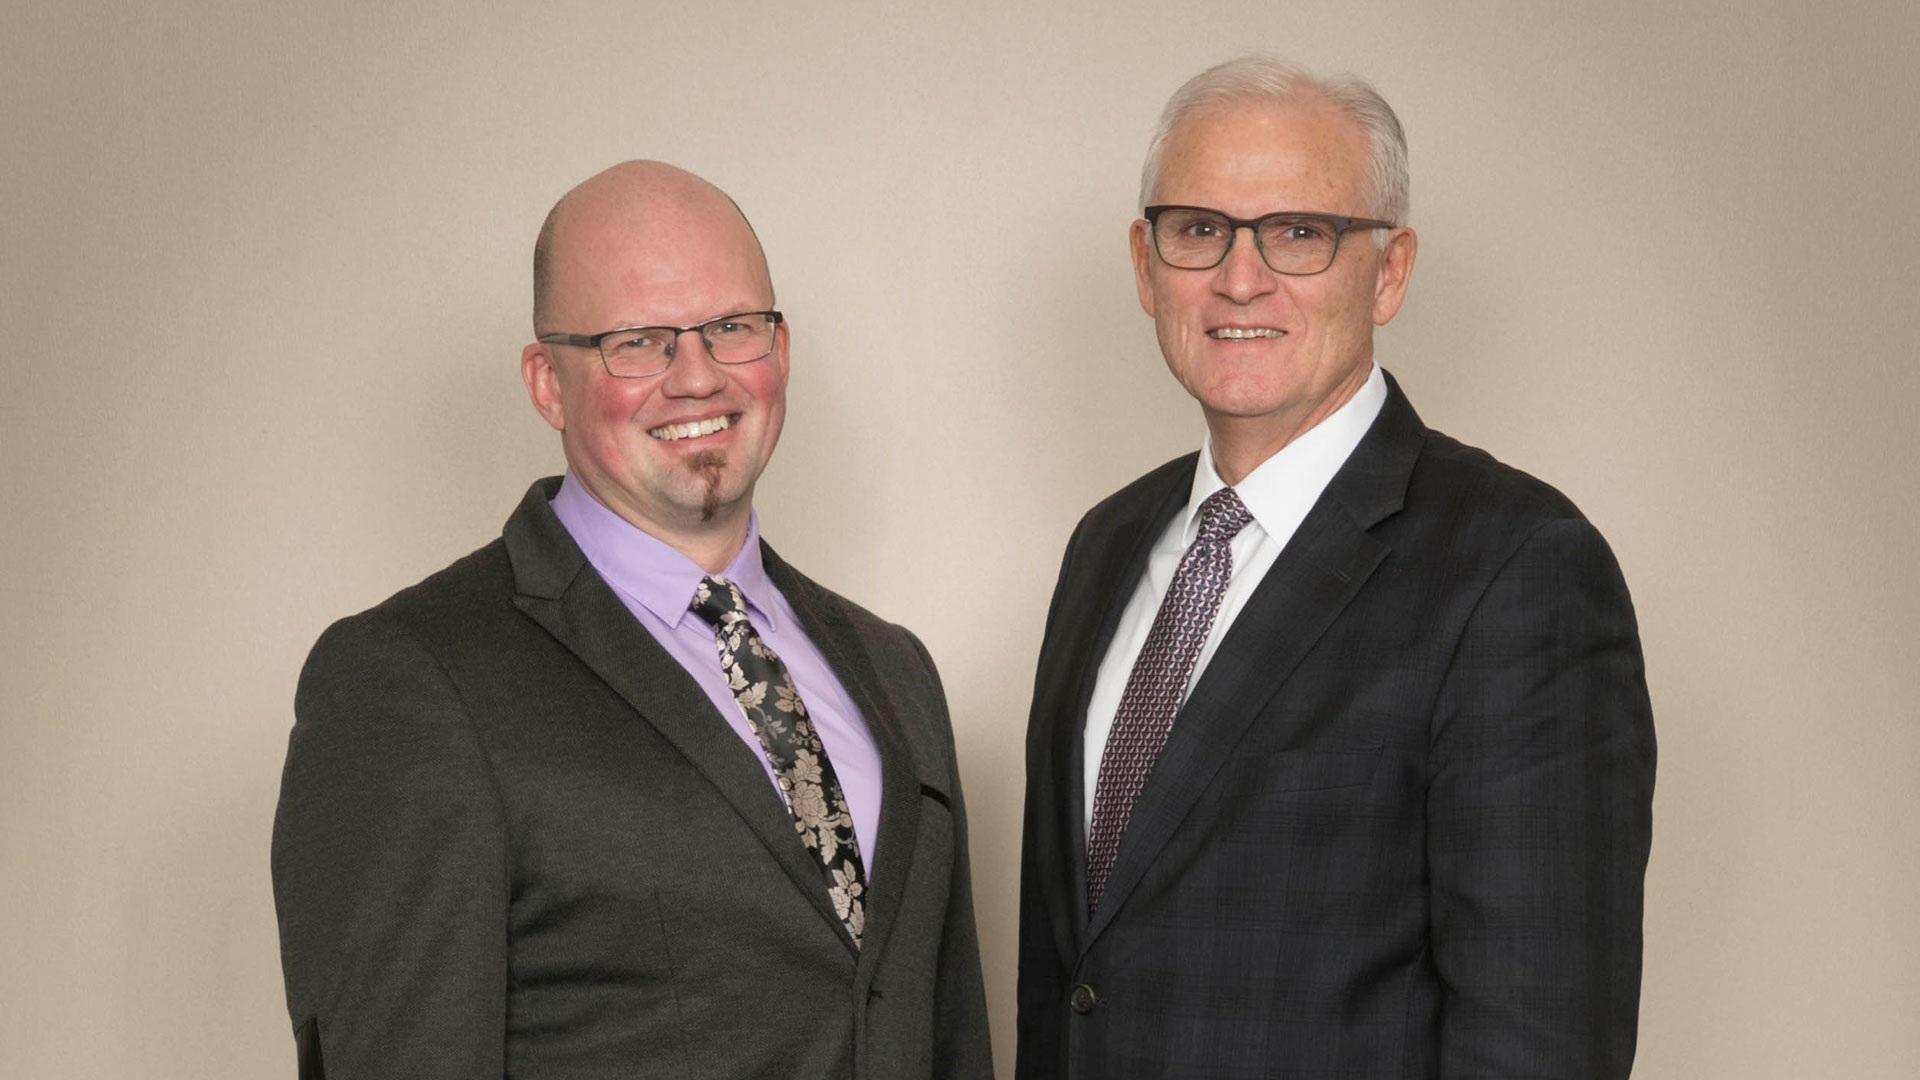 Stan Dyjur, left, and Greg Eberhart